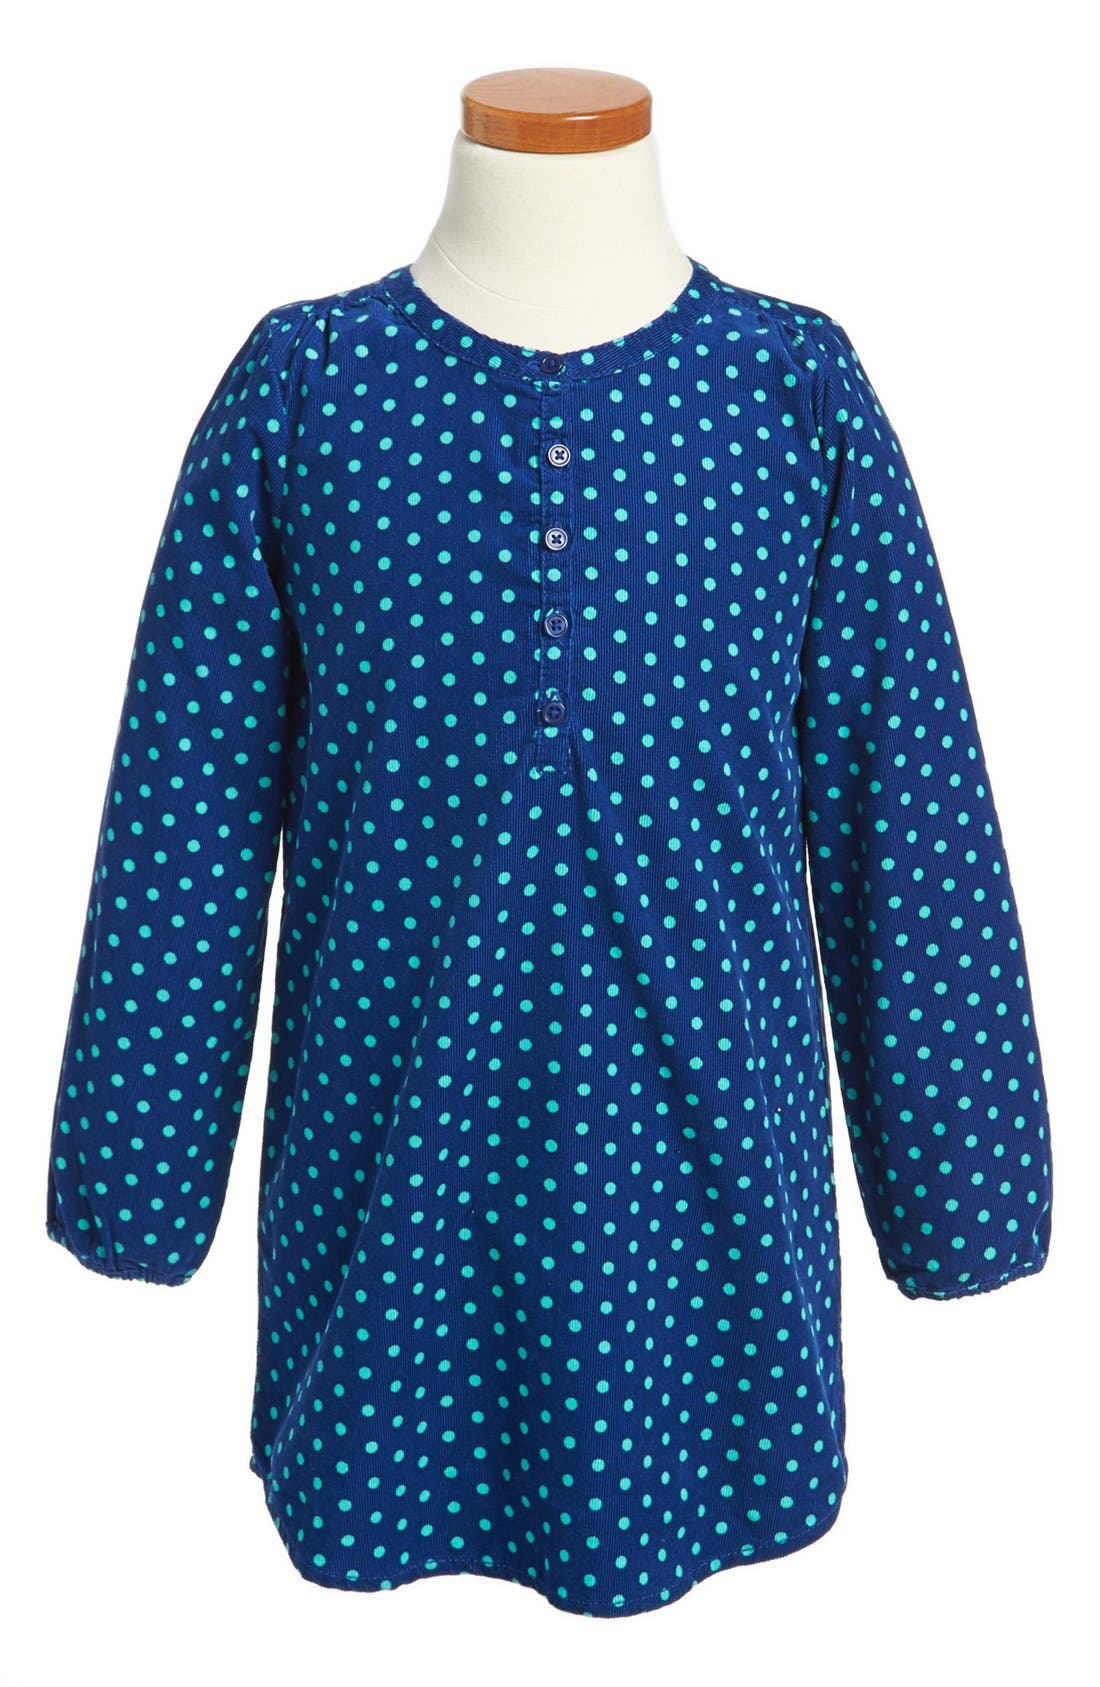 Alternate Image 1 Selected - Tucker + Tate 'Maureen' Corduroy Dress (Little Girls & Big Girls)